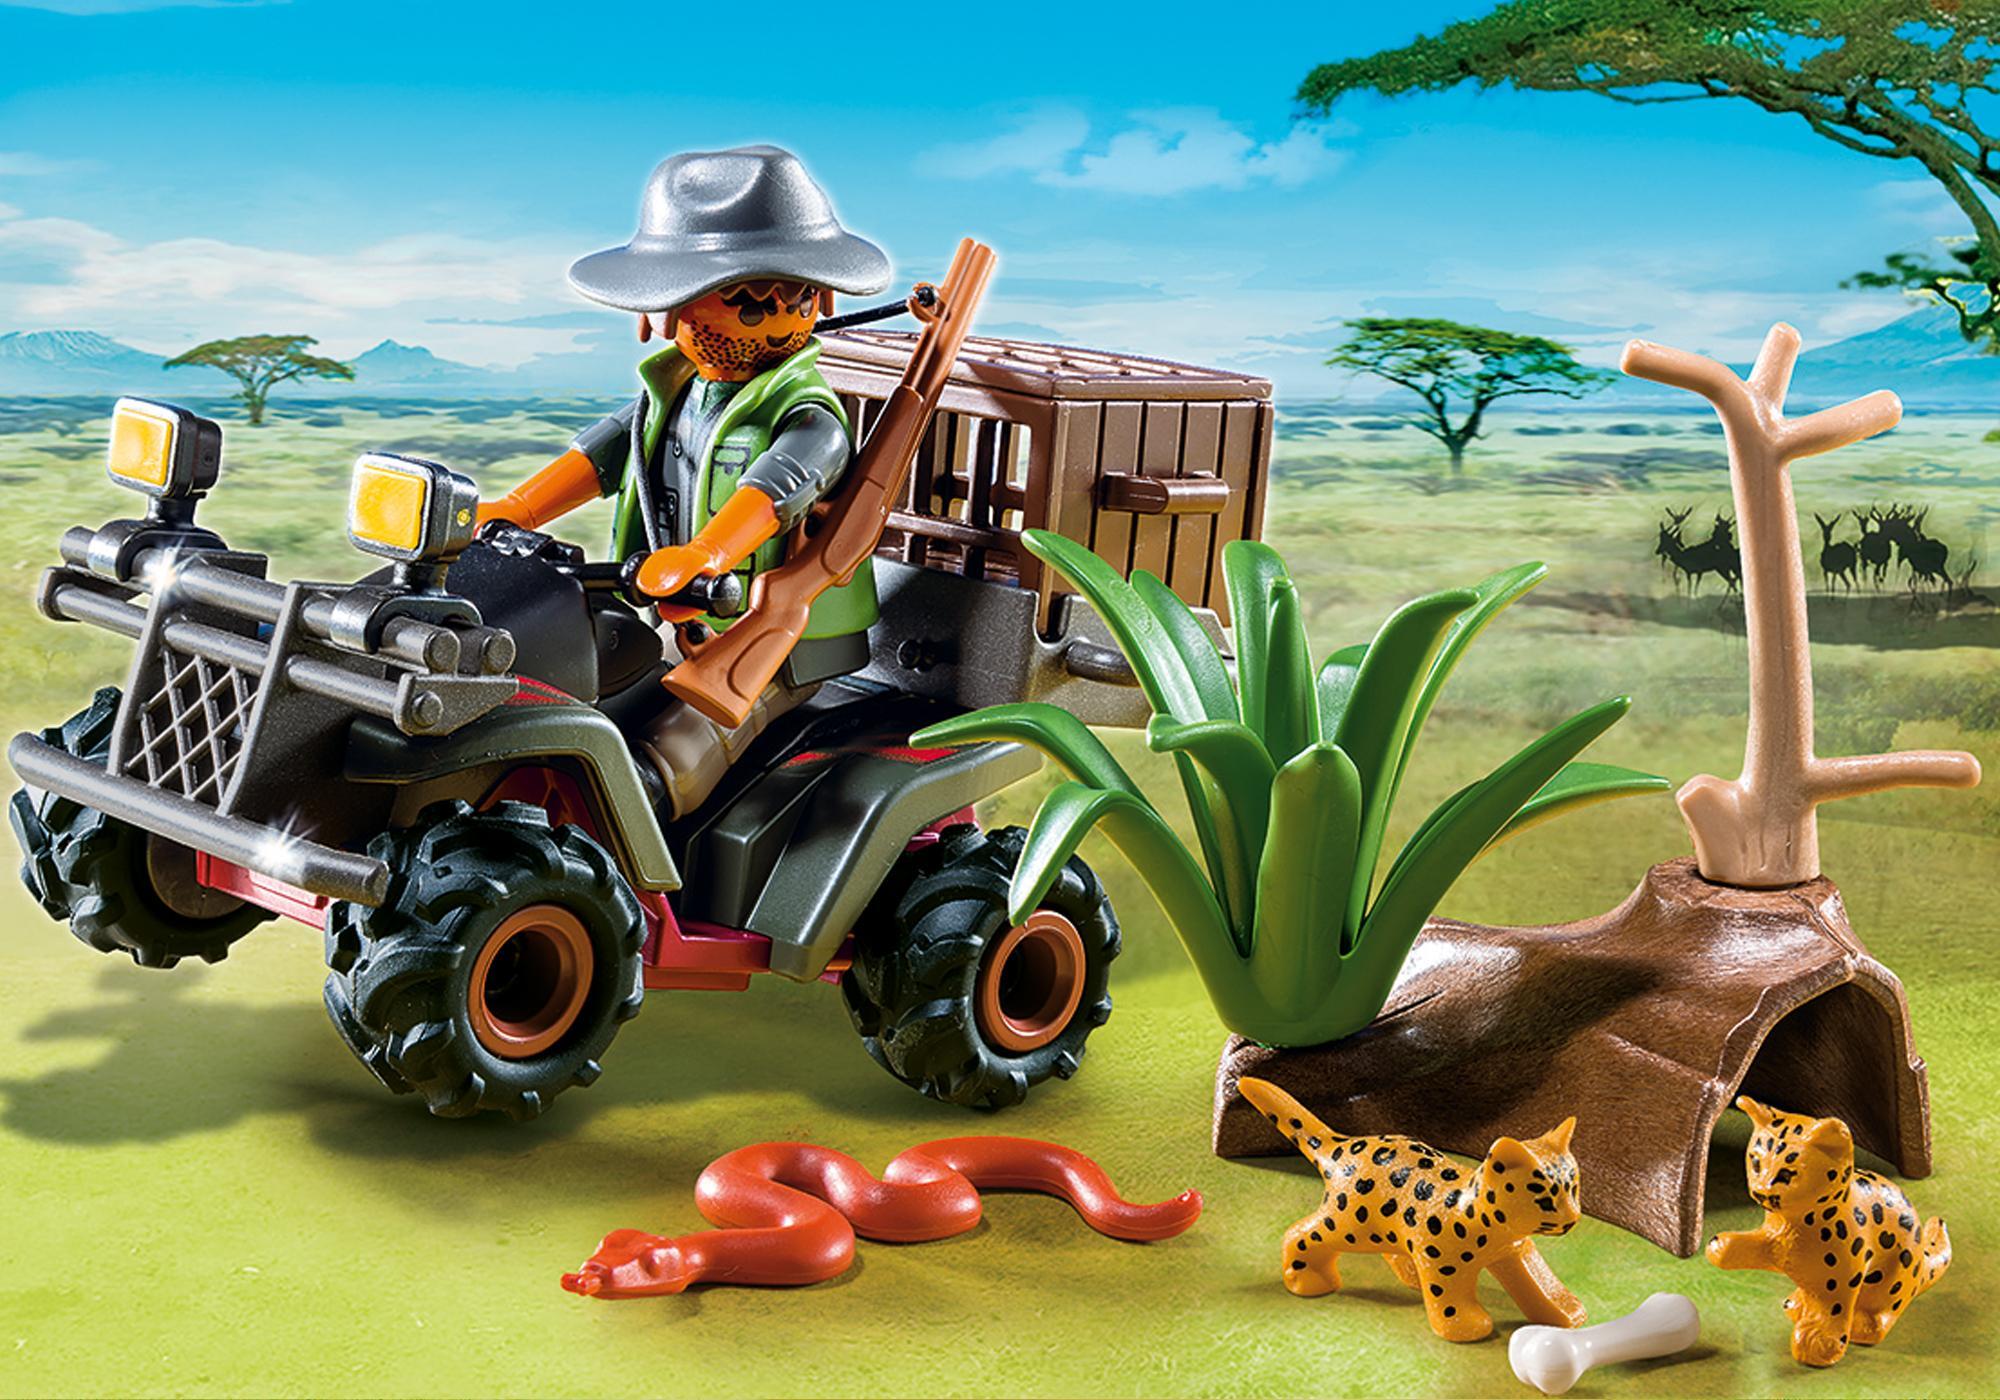 http://media.playmobil.com/i/playmobil/6939_product_detail/Stroper met quad